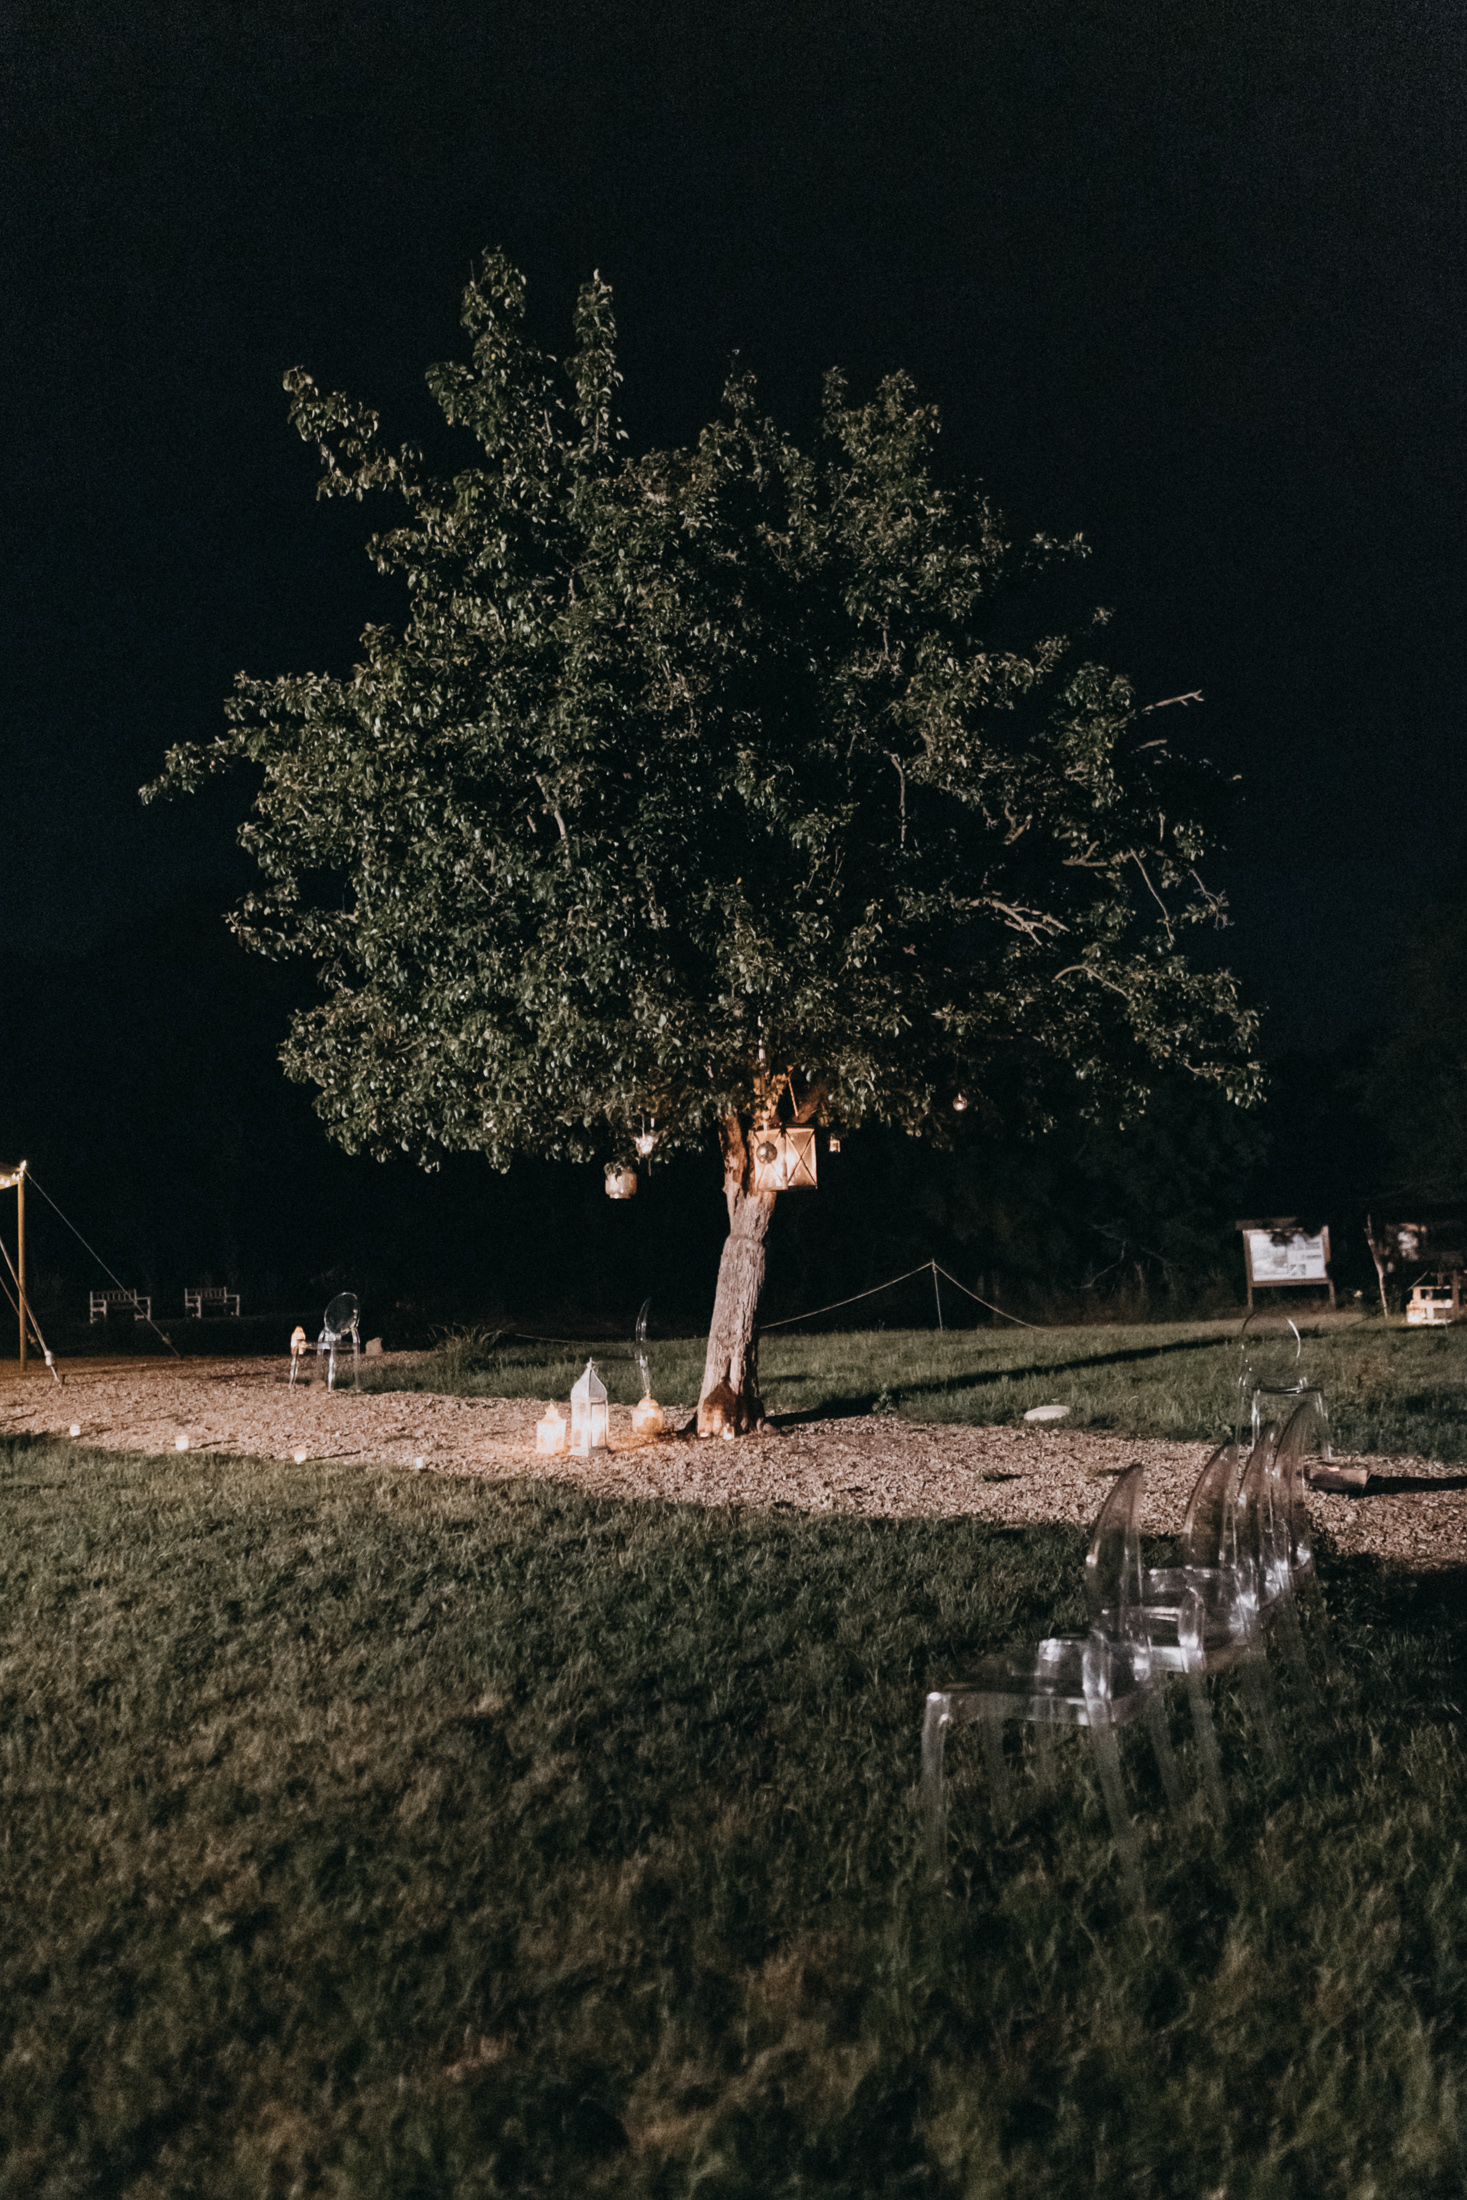 evening castle ruins wedding ideas